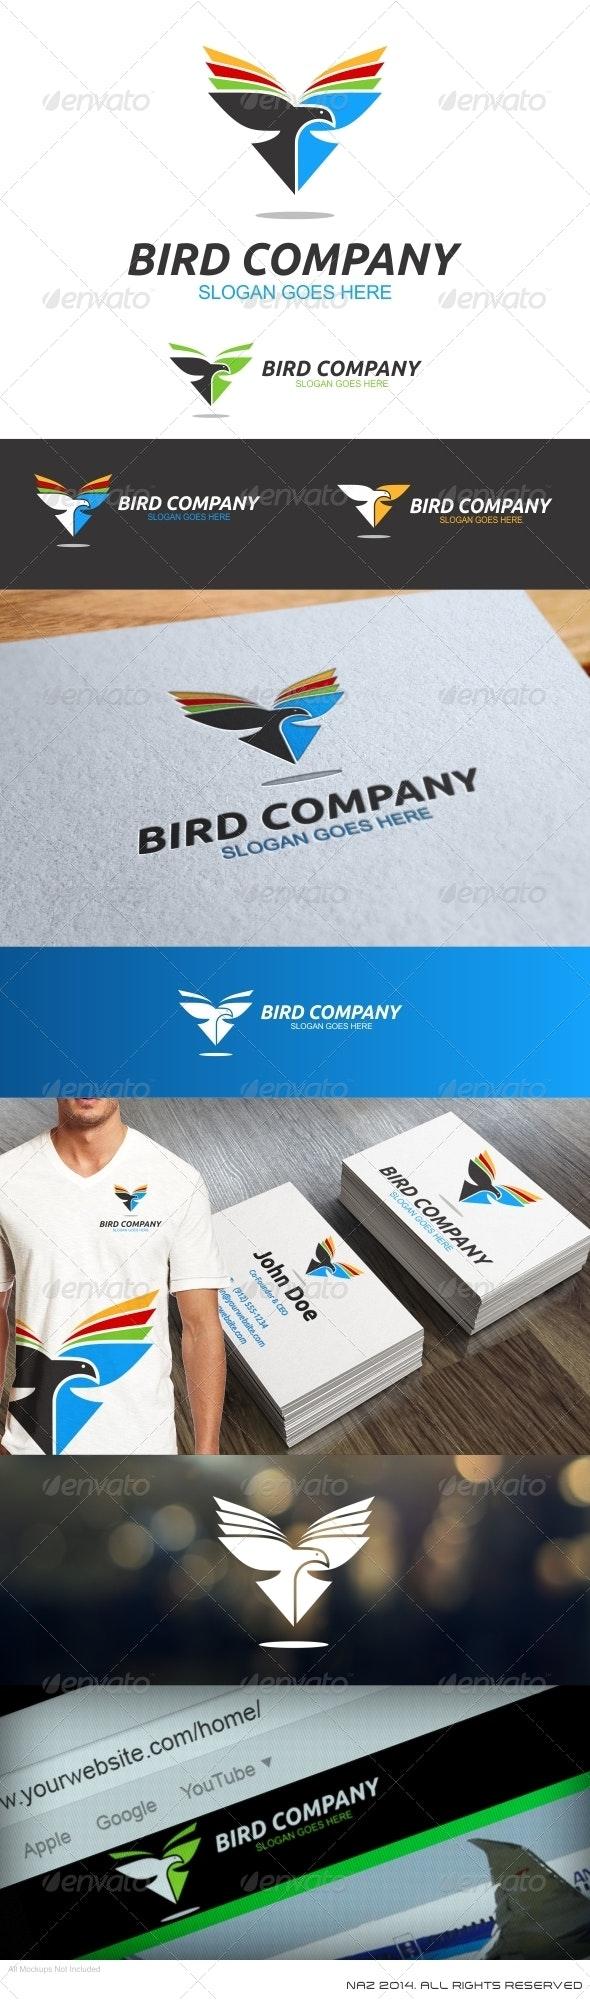 Bird Company Logo - Animals Logo Templates